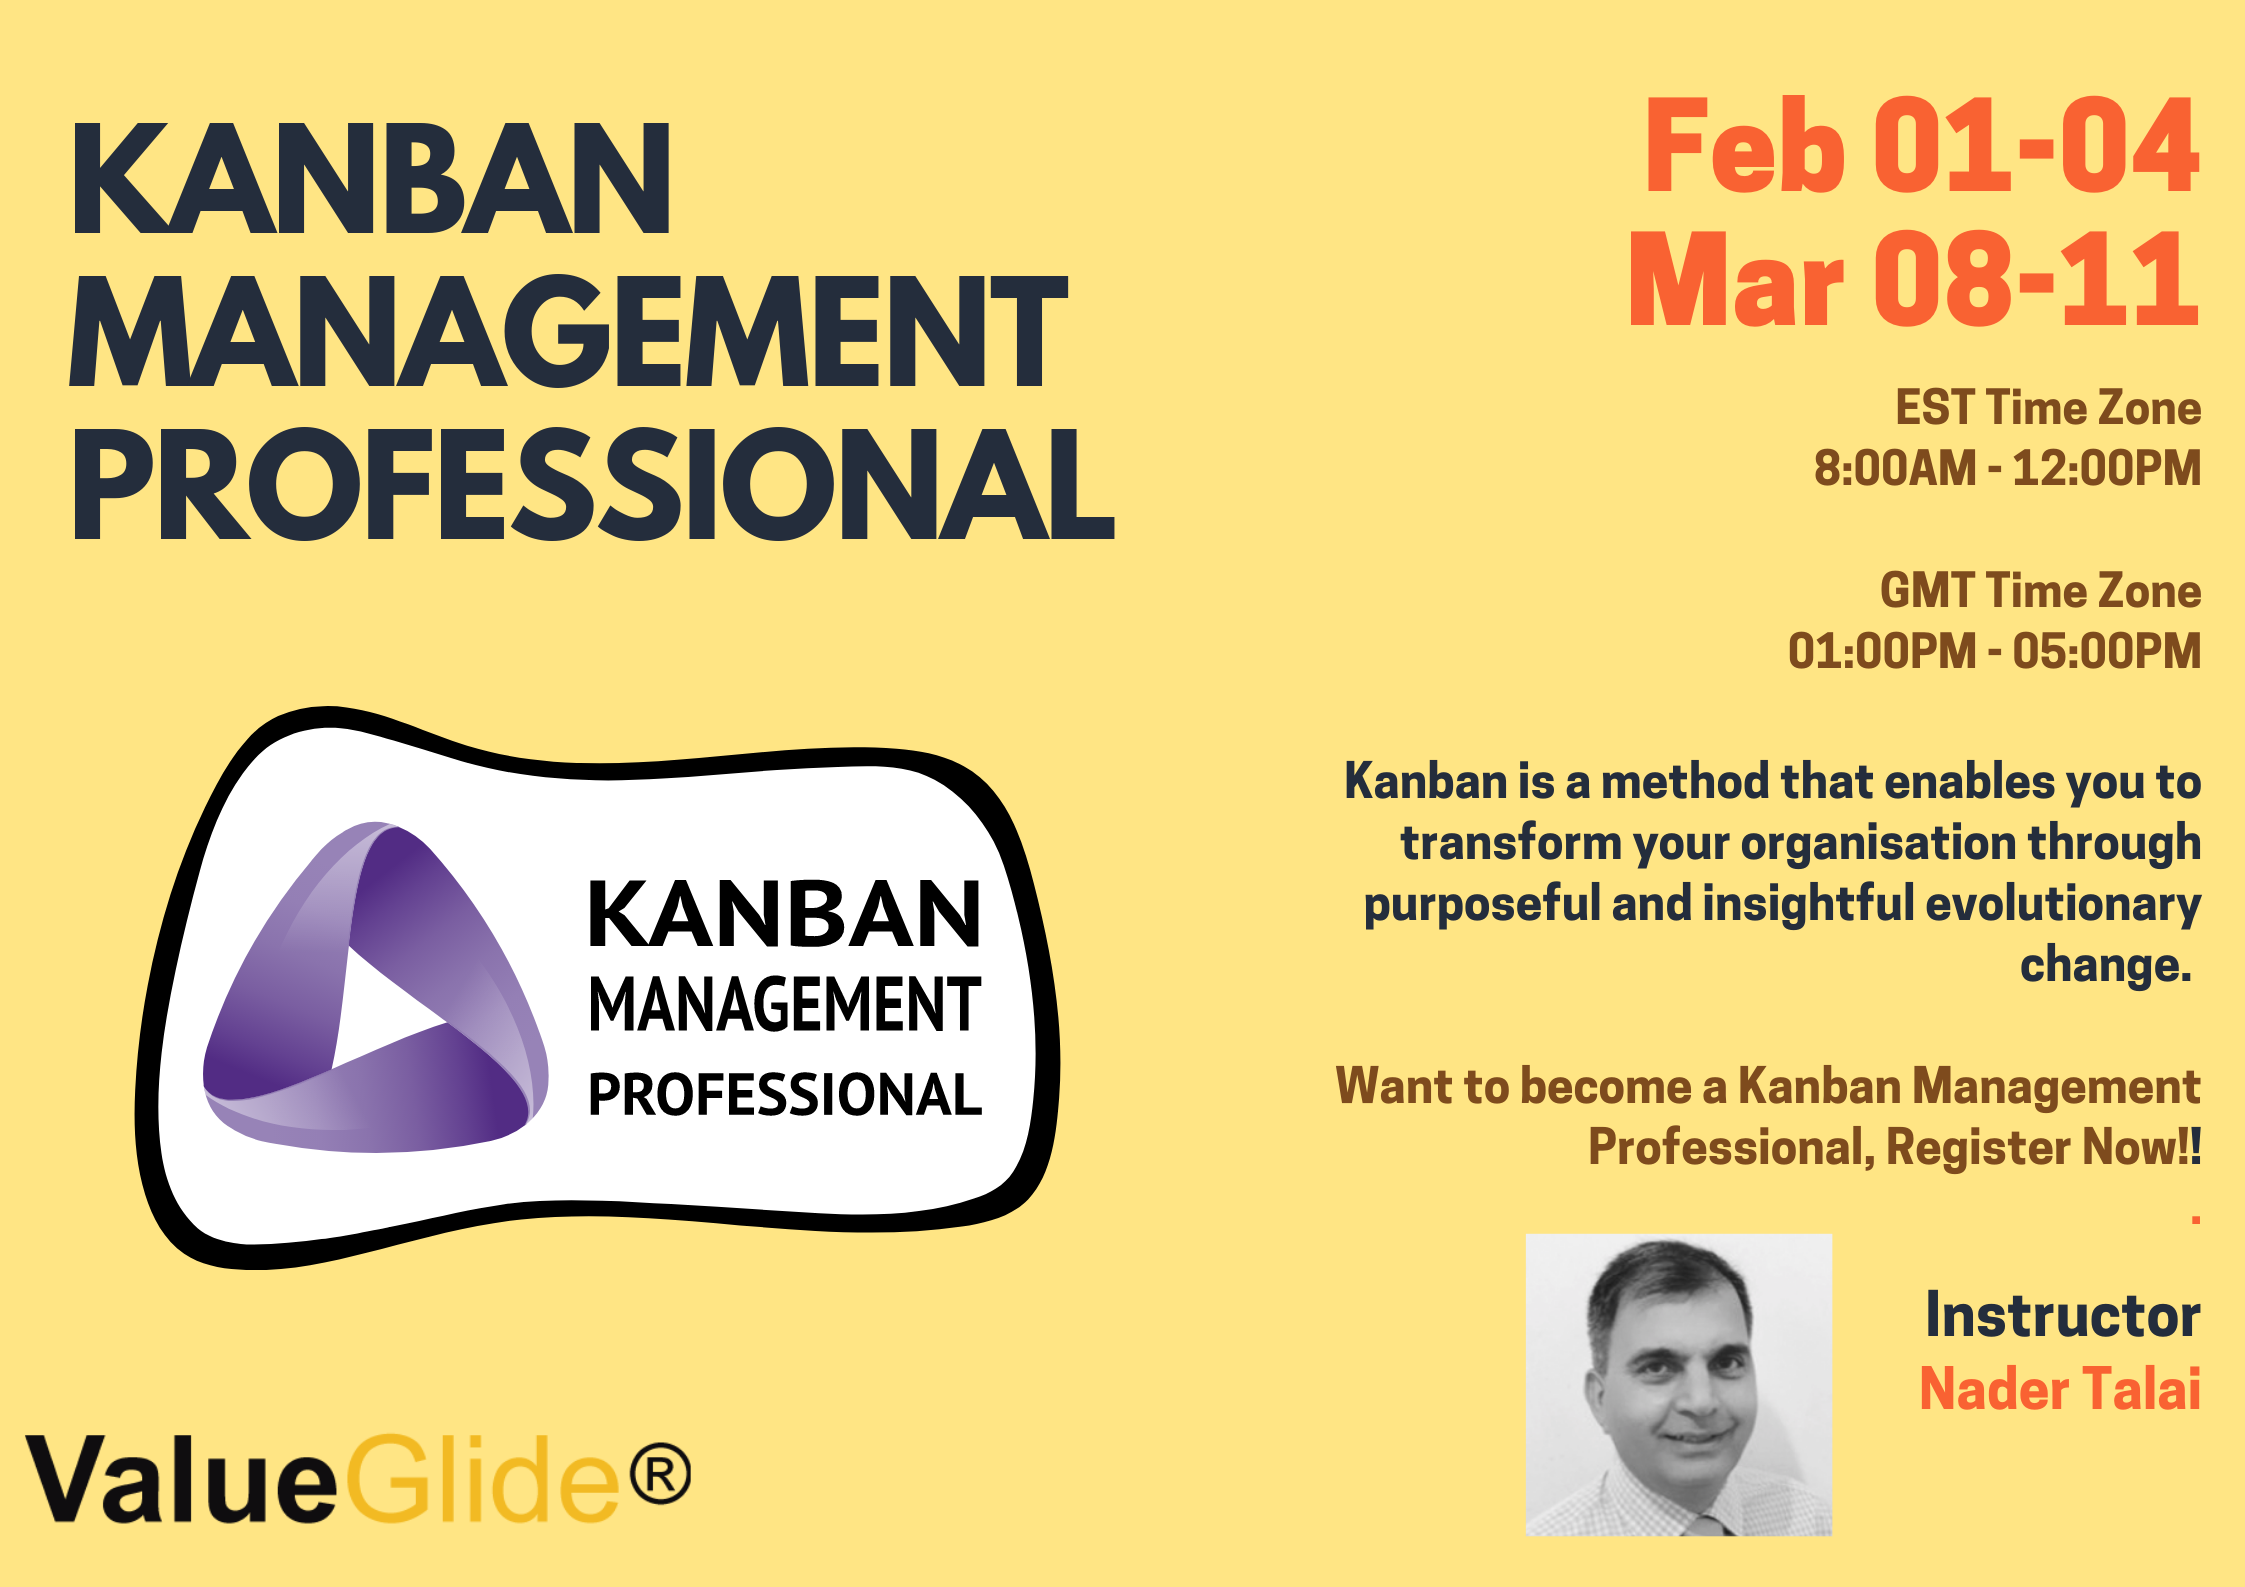 kanban management professional course CTA